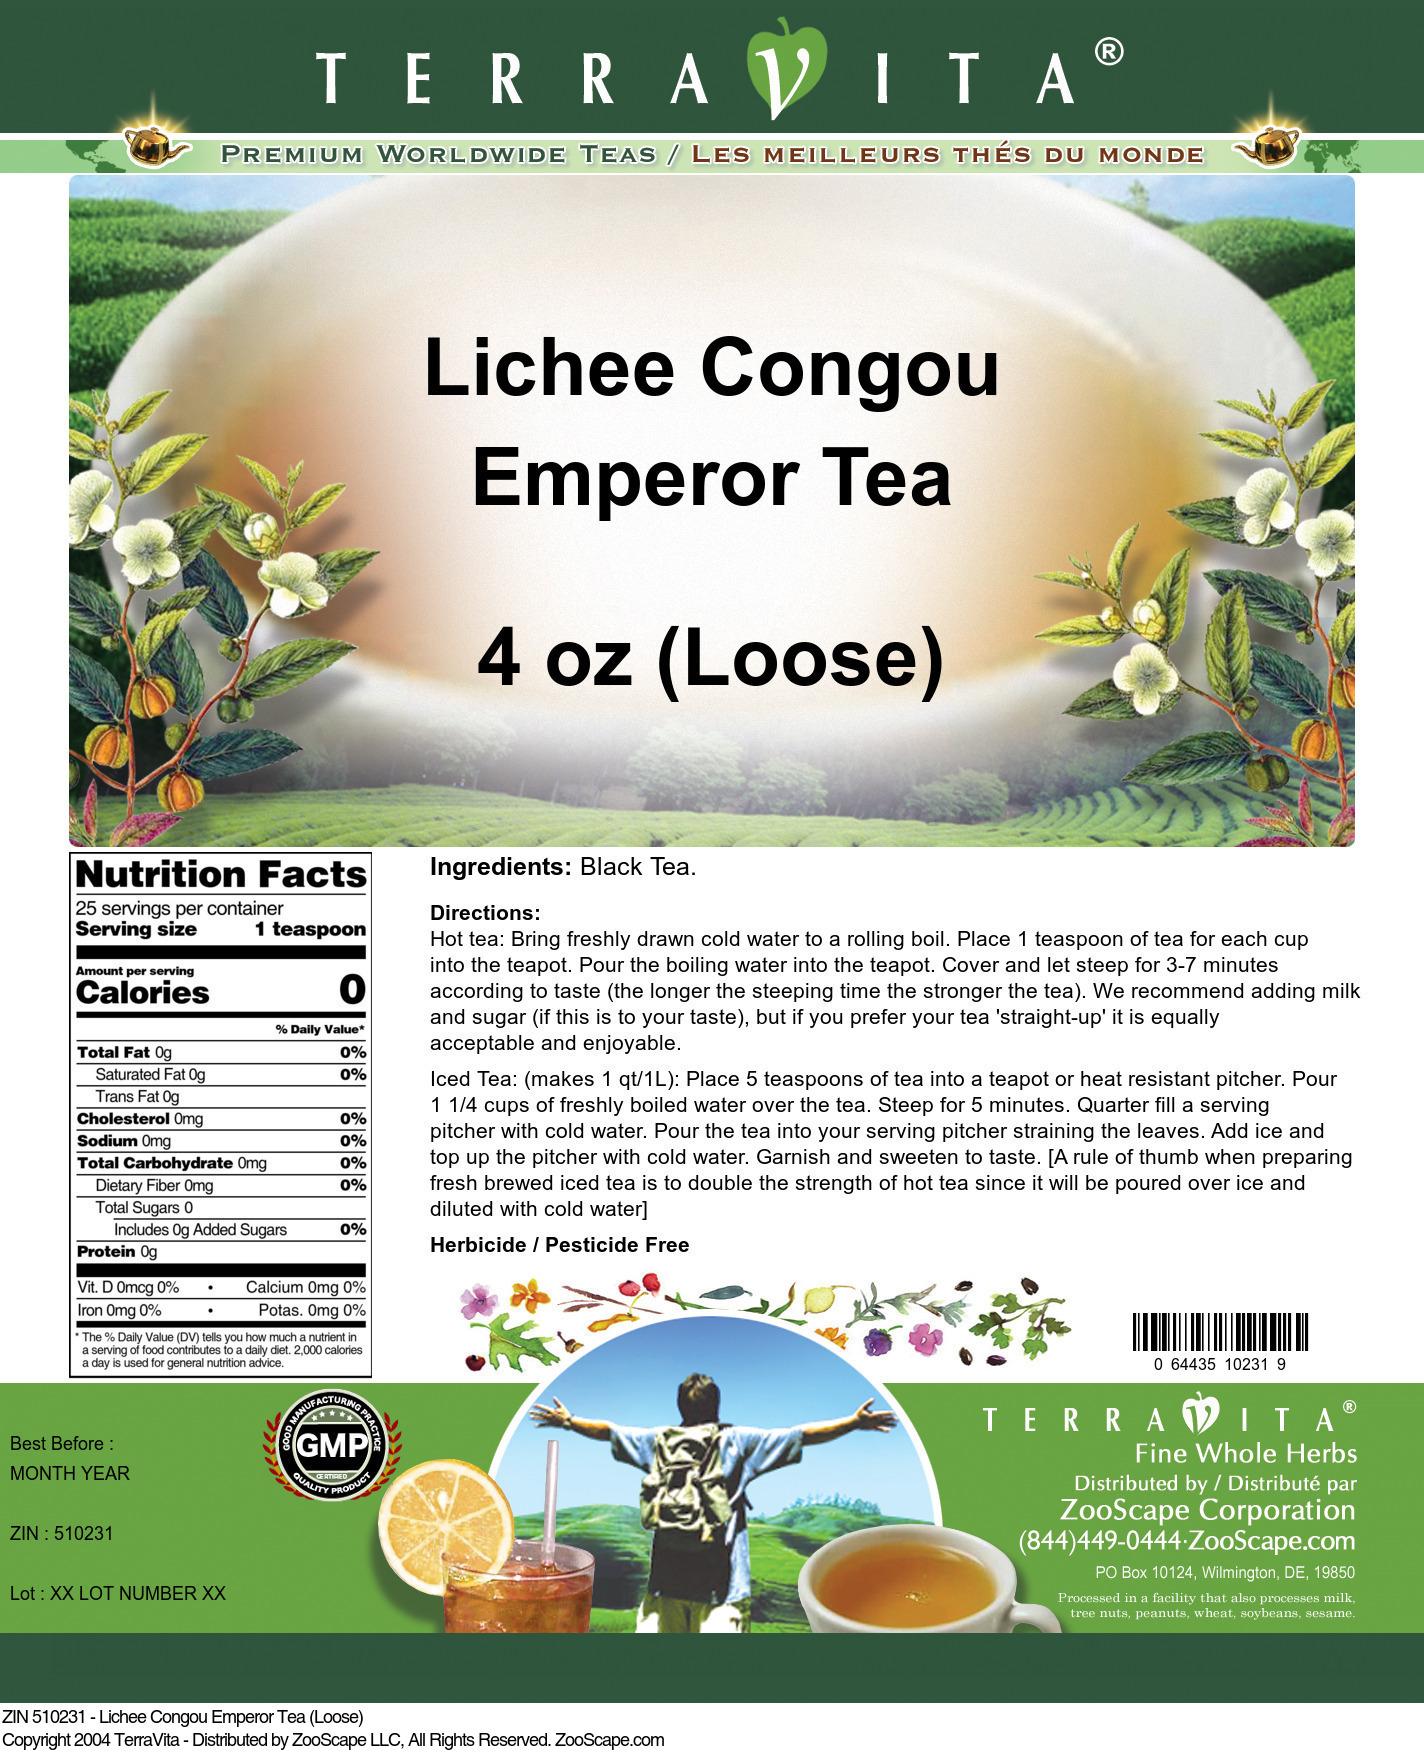 Lichee Congou Emperor